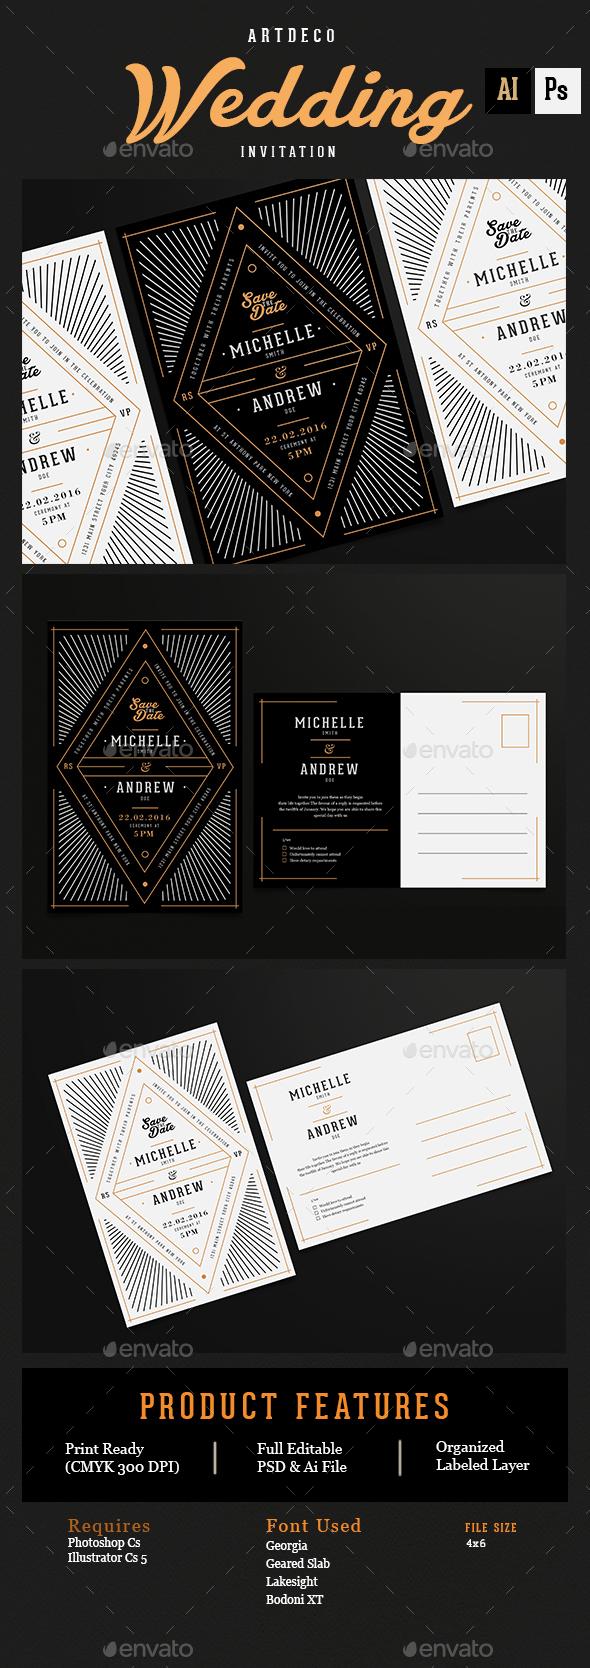 Art Deco Wedding Invitation/Card